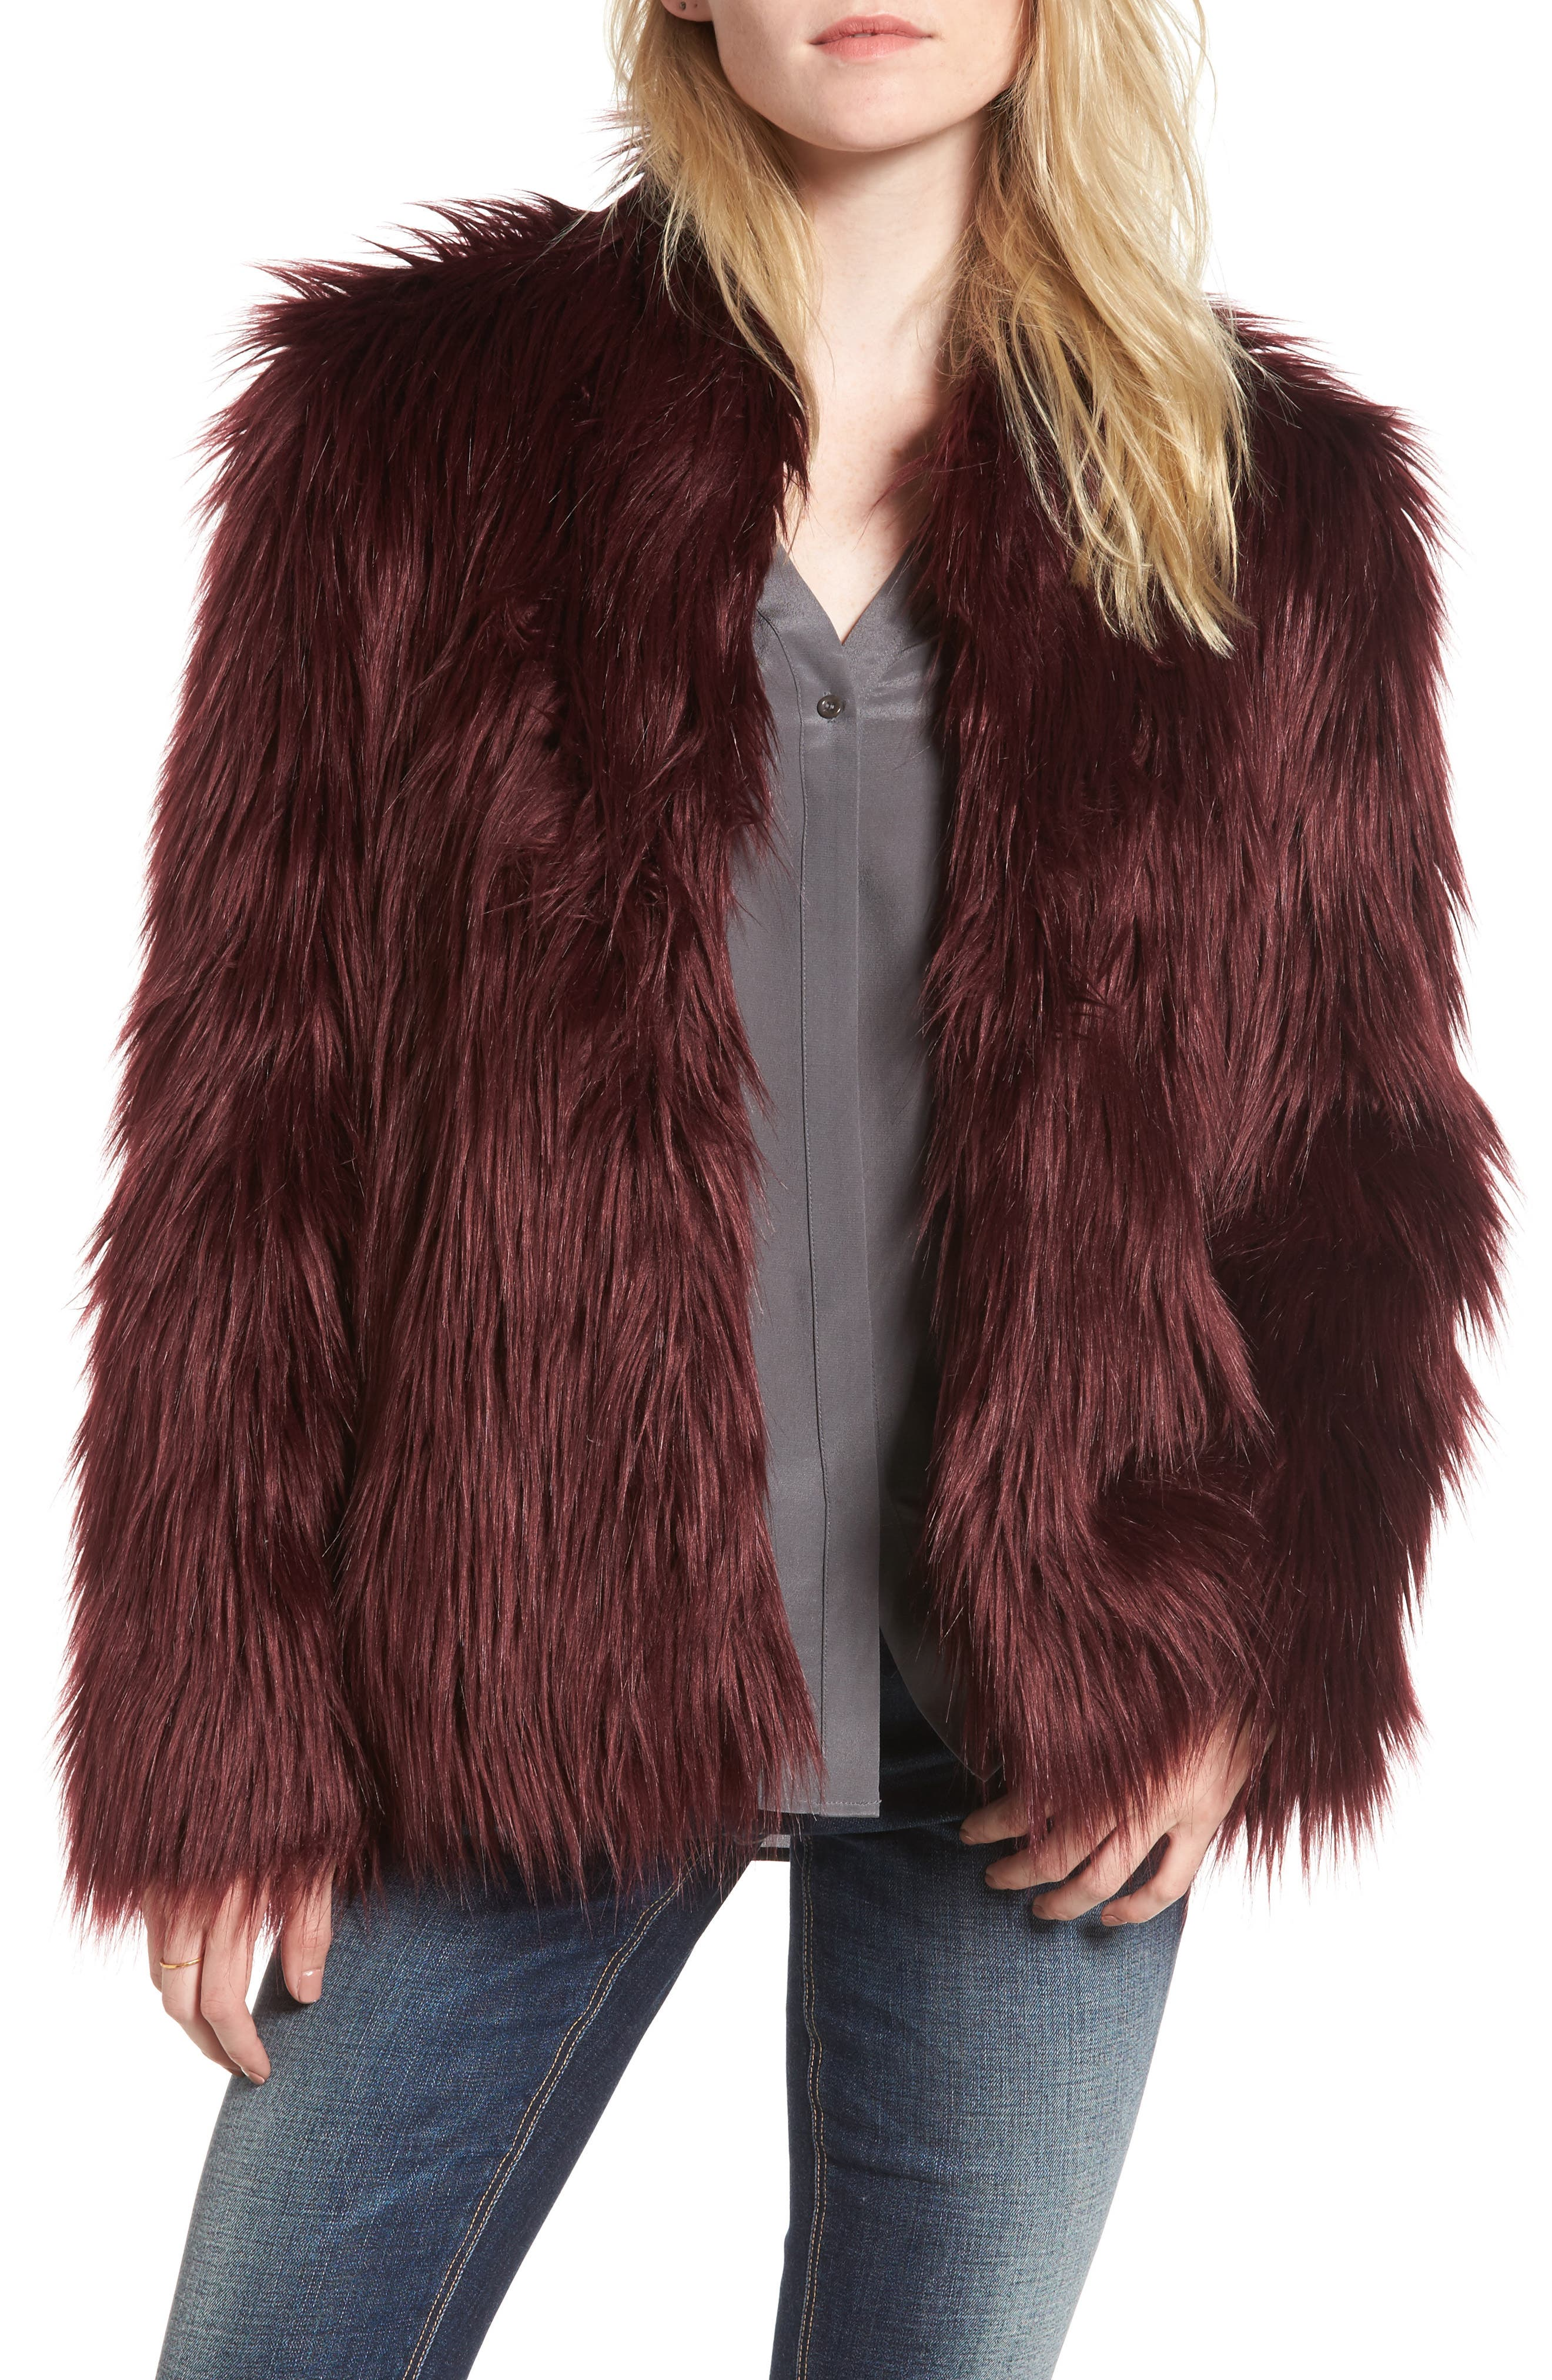 Alternate Image 1 Selected - Chelsea28 Faux Fur Jacket